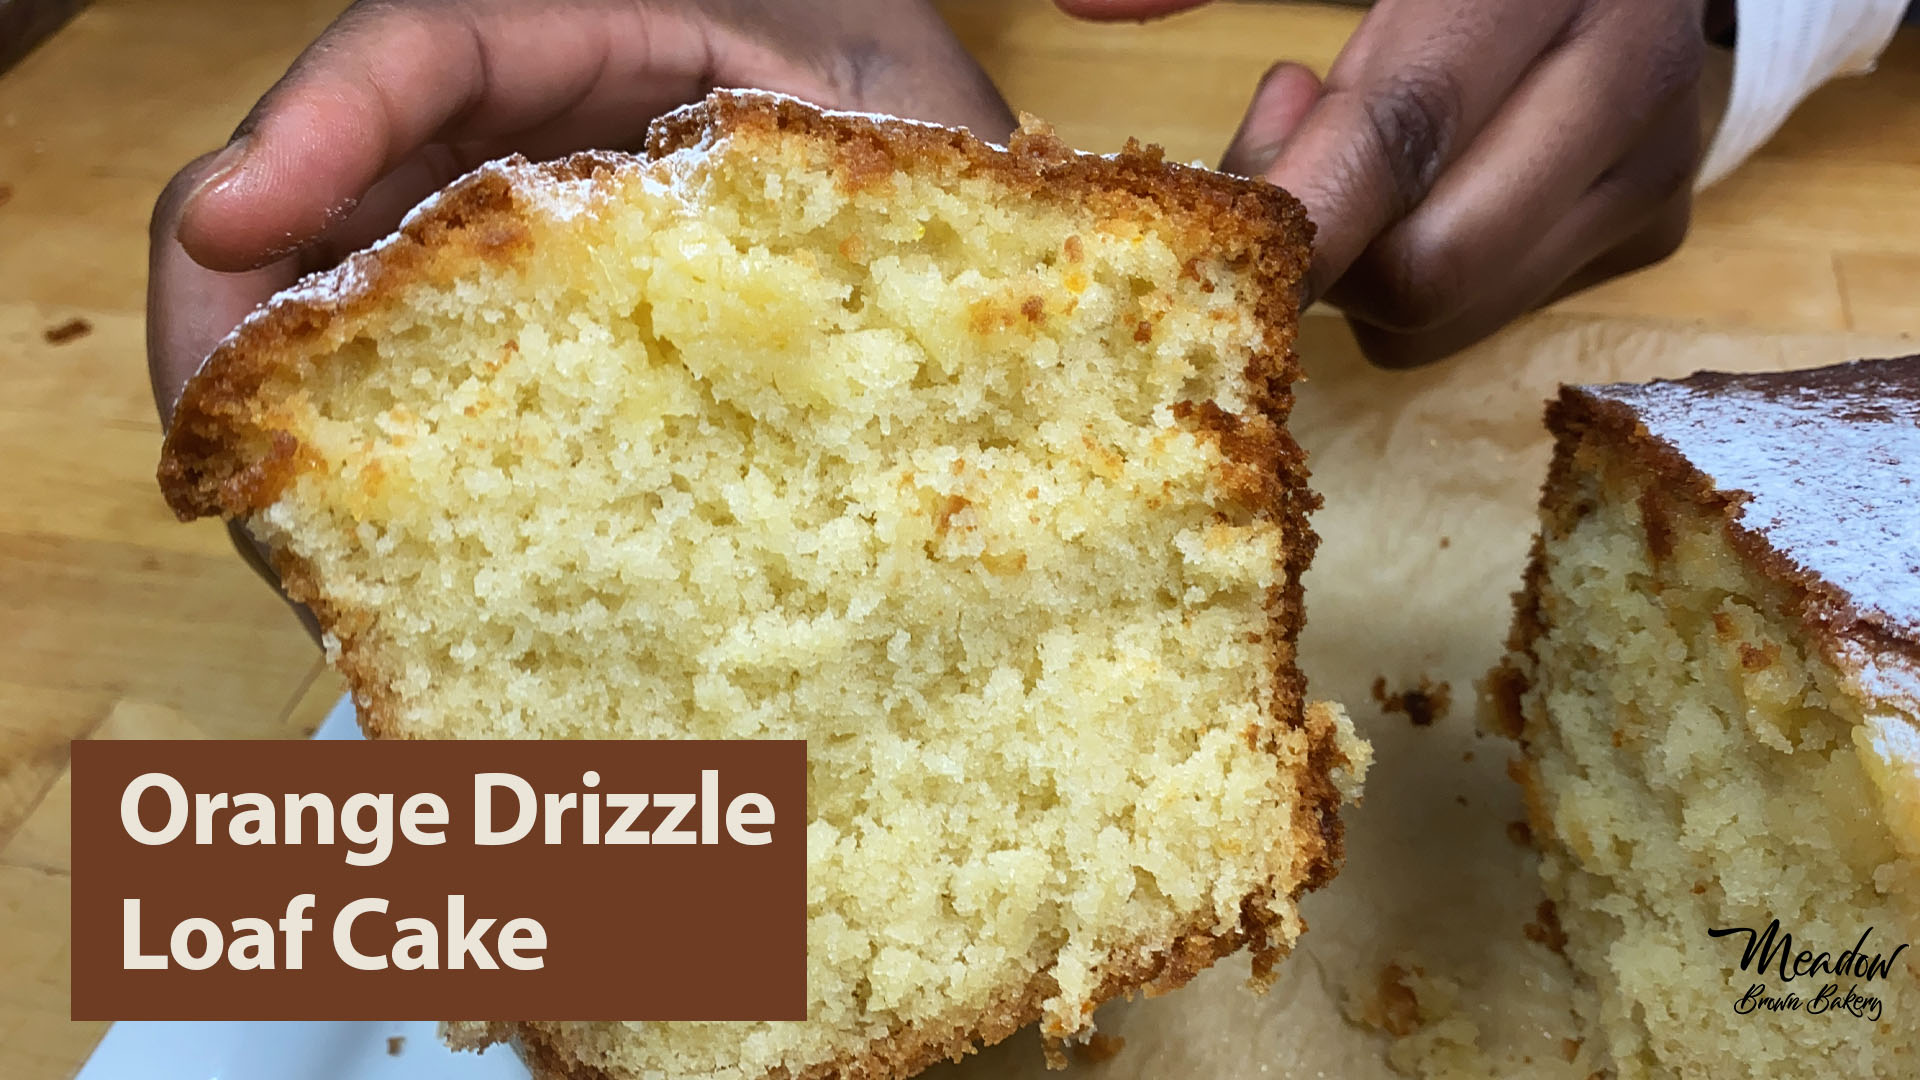 Orange drizzle loaf cake